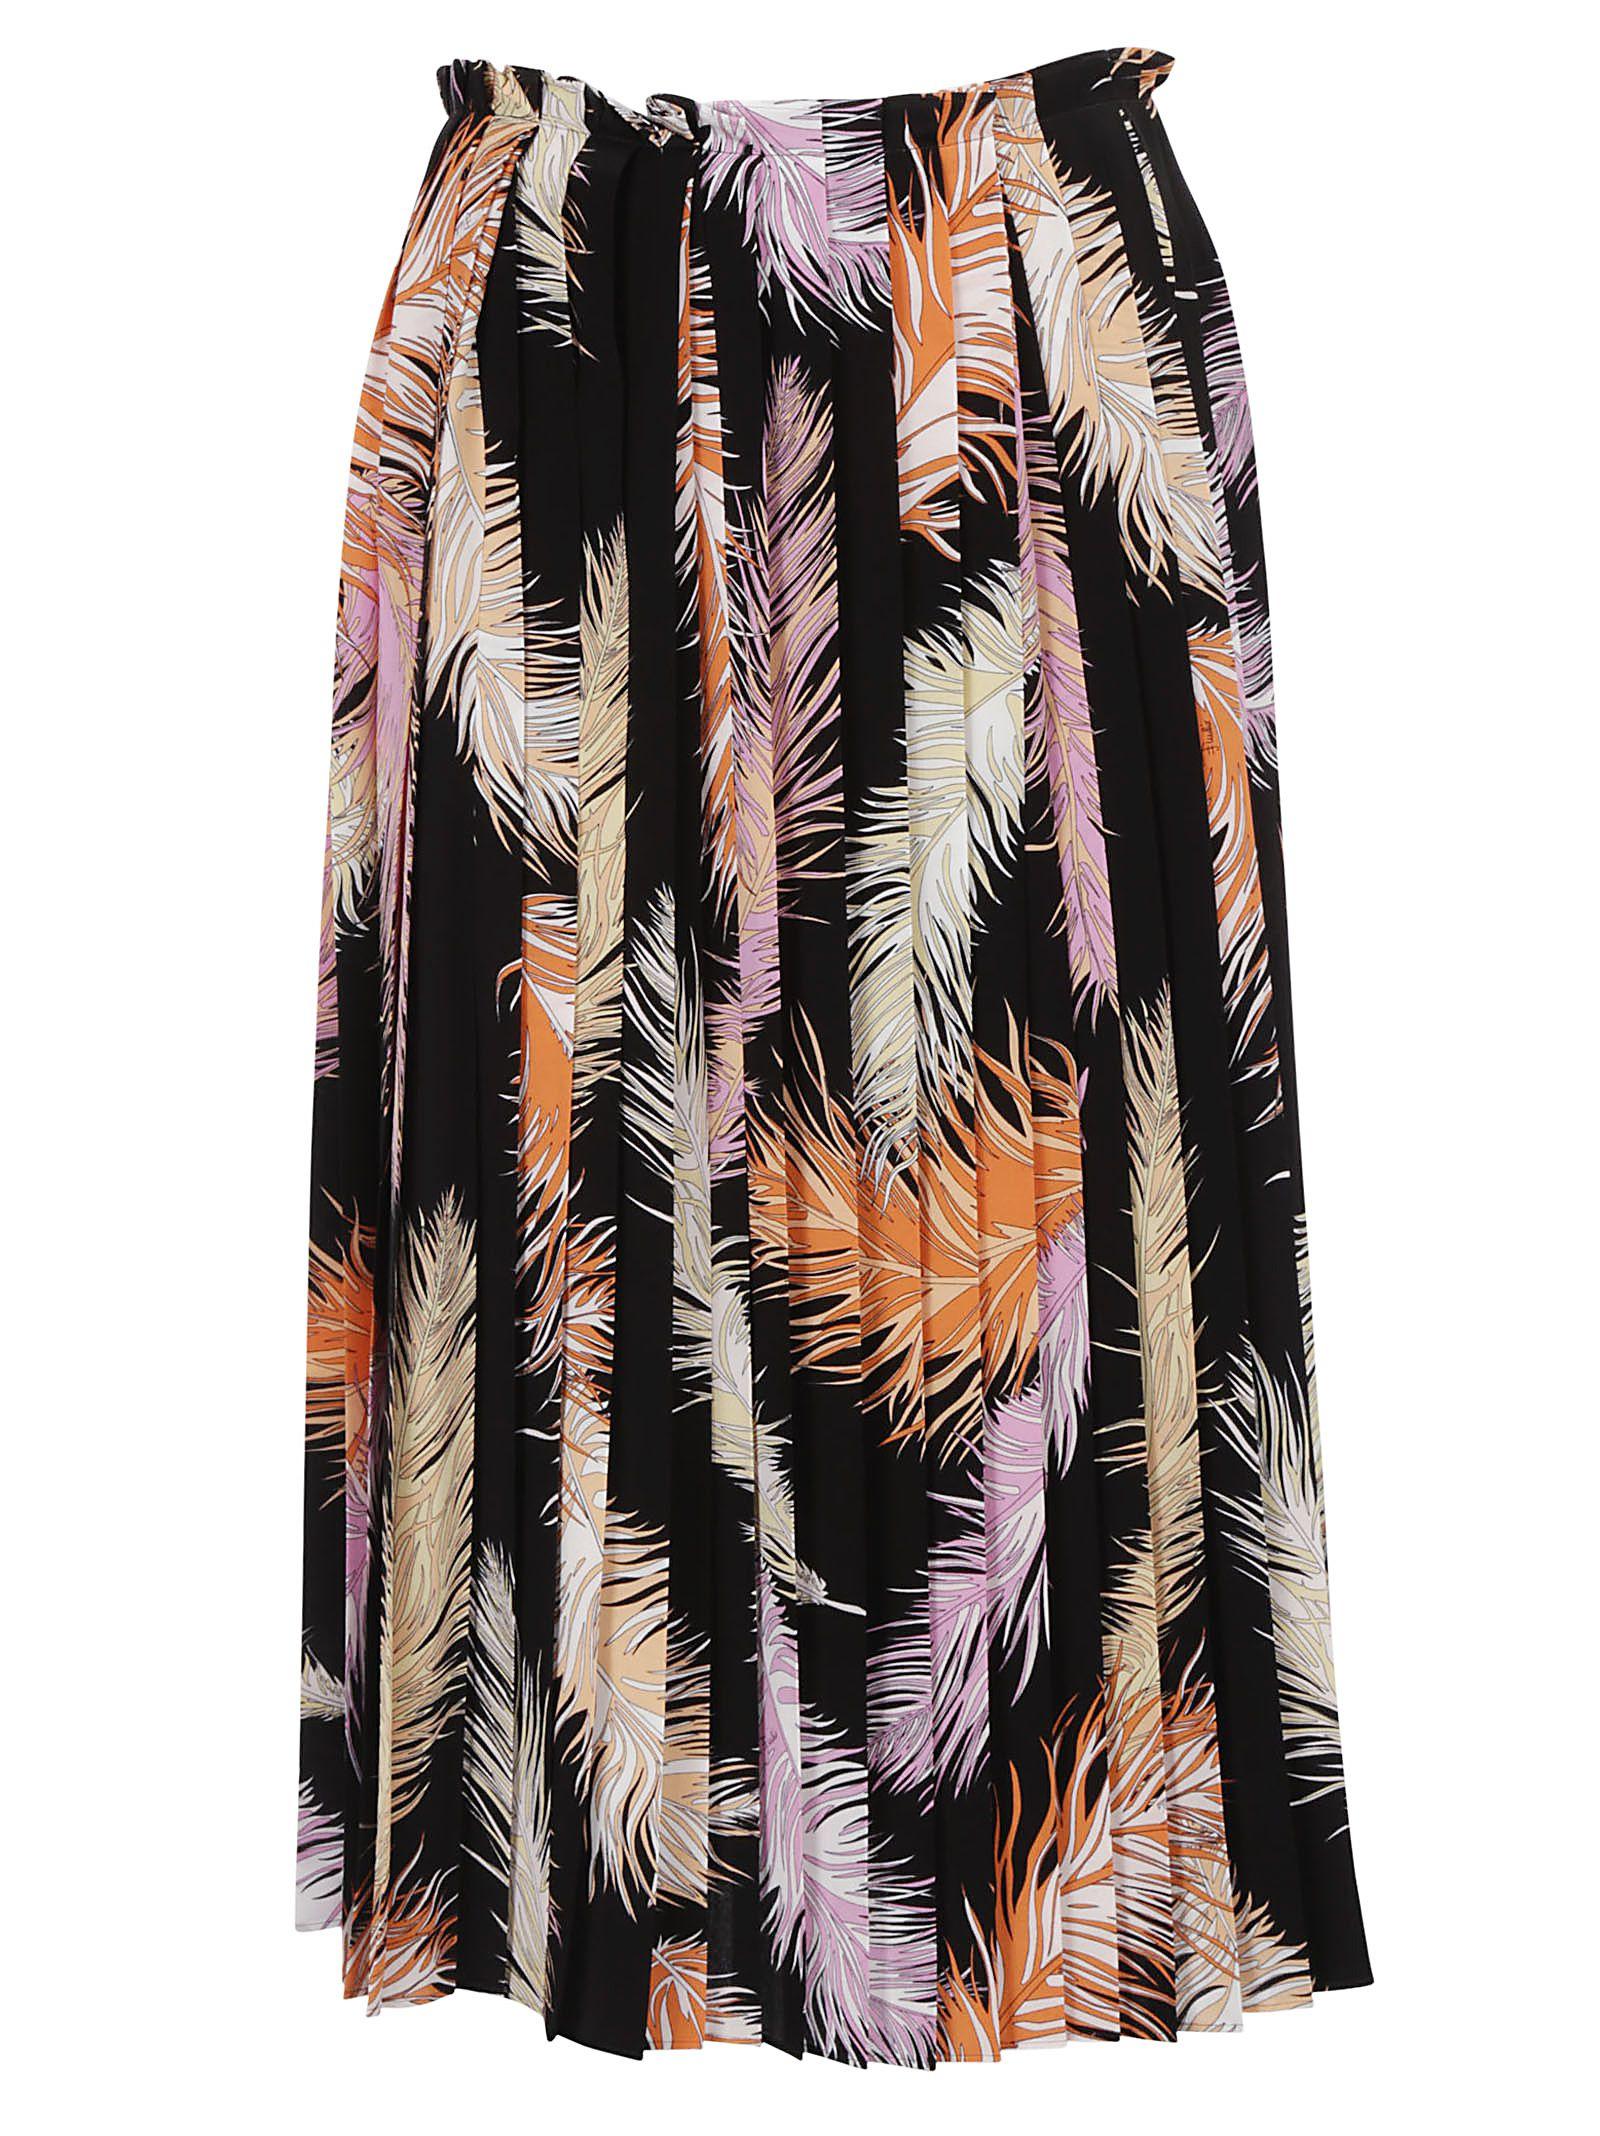 Emilio Pucci Plume Print Skirt